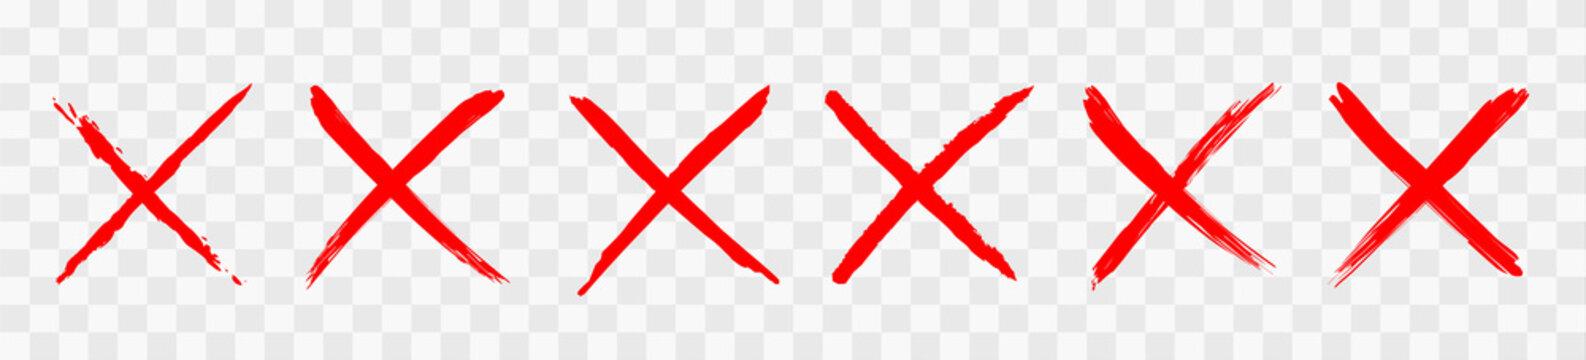 Red wrong mark. Vector illustration